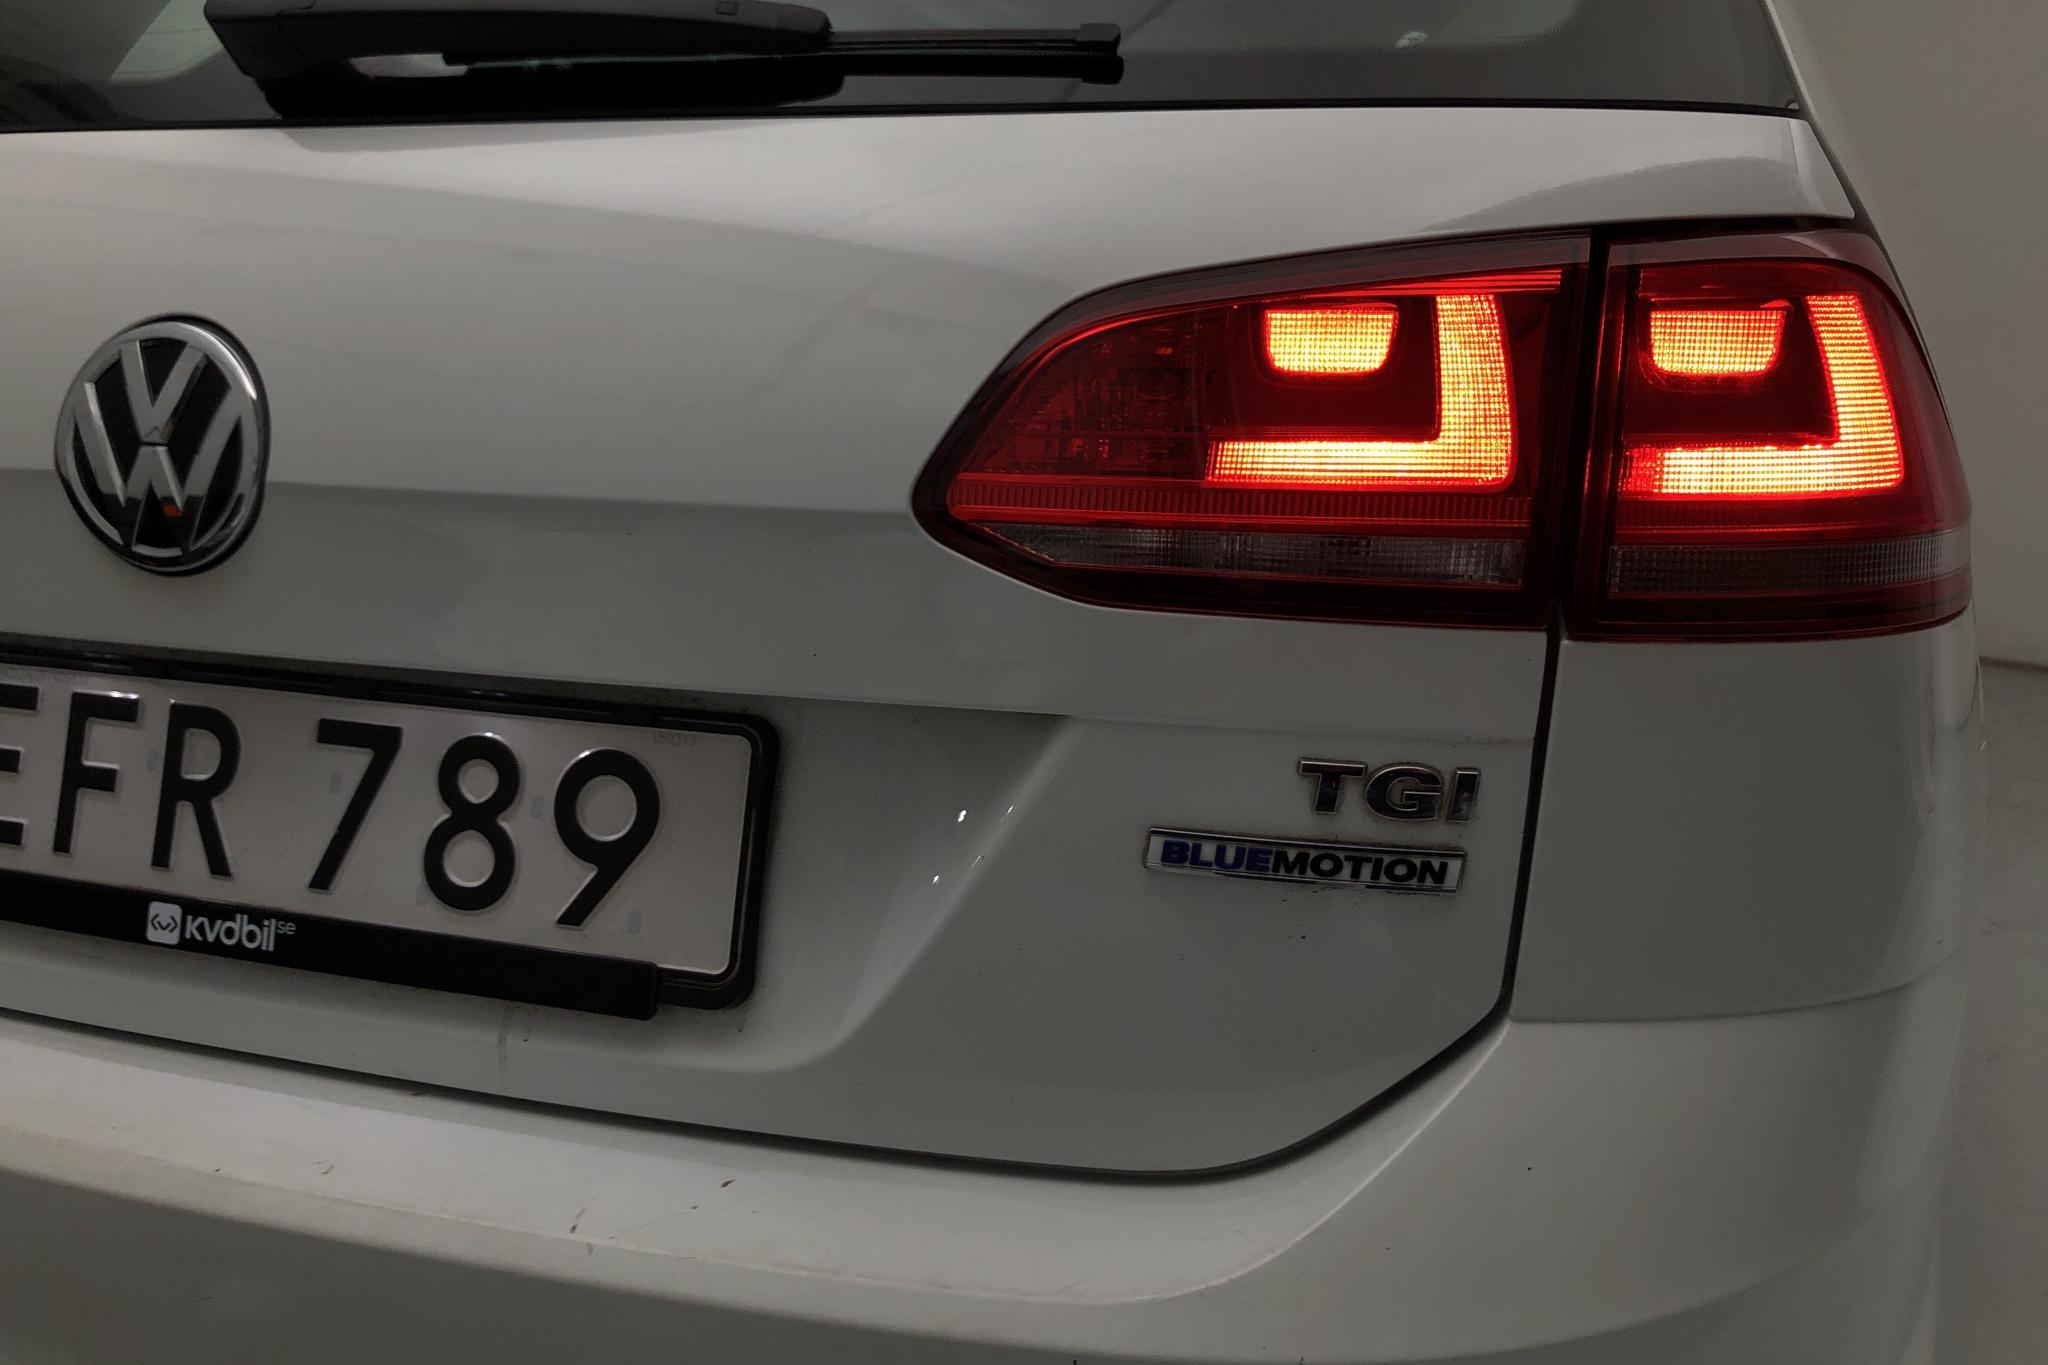 VW Golf VII 1.4 TGI BlueMotion Sportscombi (110hk) - 94 430 km - Manual - white - 2015